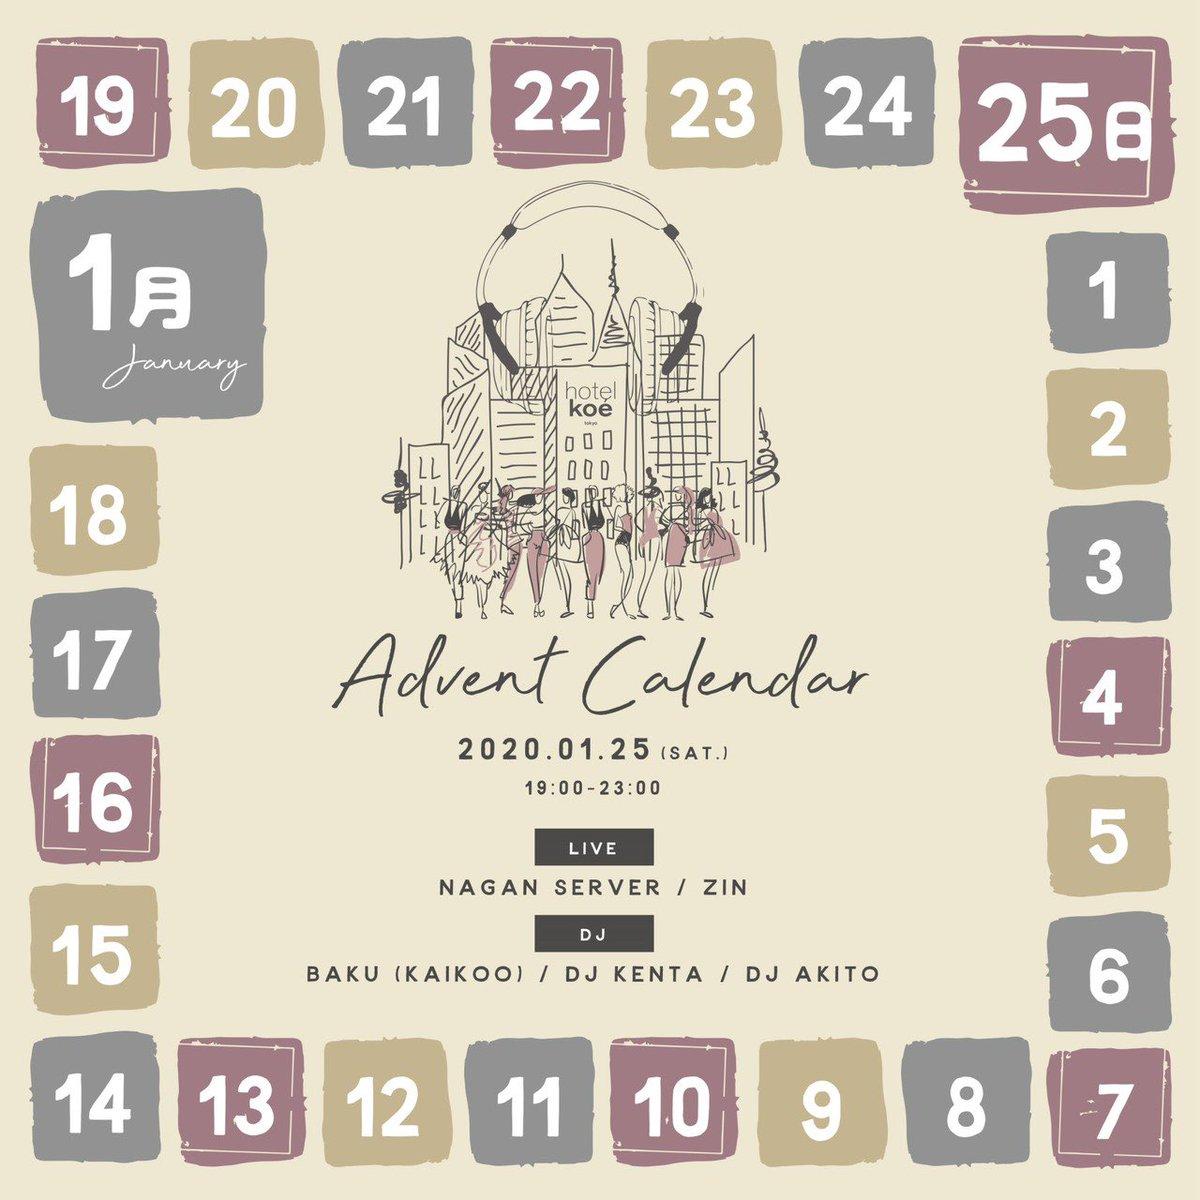 TONIGHT🕺💃1/25 Advent Calendar19:00-23:00¥1,000/1DLIVENAGAN SERVERZINDJBAKU(KAIKOO)DJ KENTADJ AKITO【タイムテーブル公開】19:00-20:00 DJ AKITO20:00-20:30 ZIN20:30-21:30 DJ KENTA21:30-22:00 NAGAN SEVER22:00-23:00 BAKU(KAIKOO)